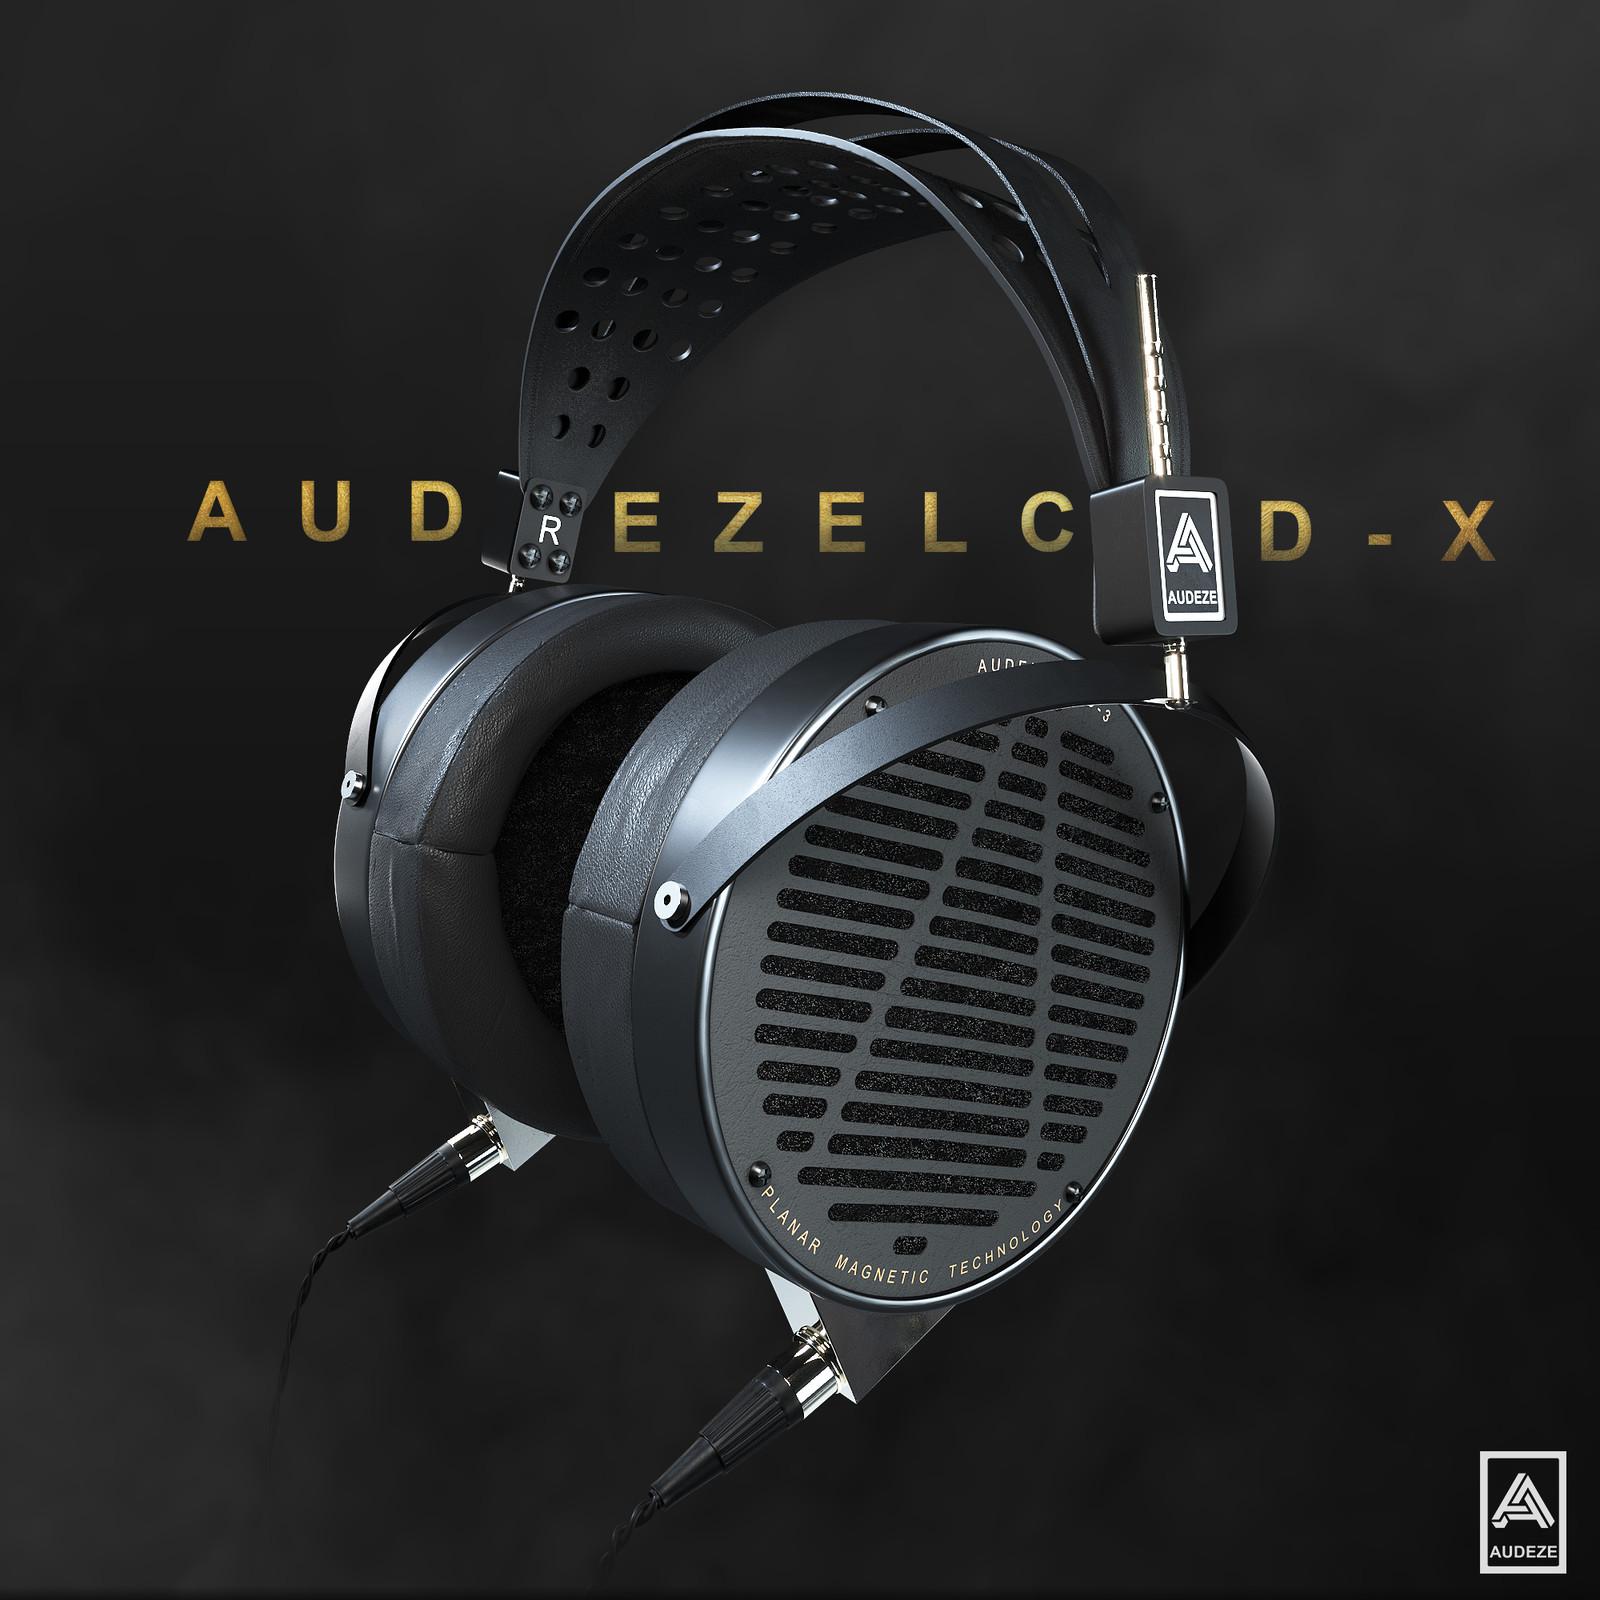 Audeze LCD-3 X Headphones